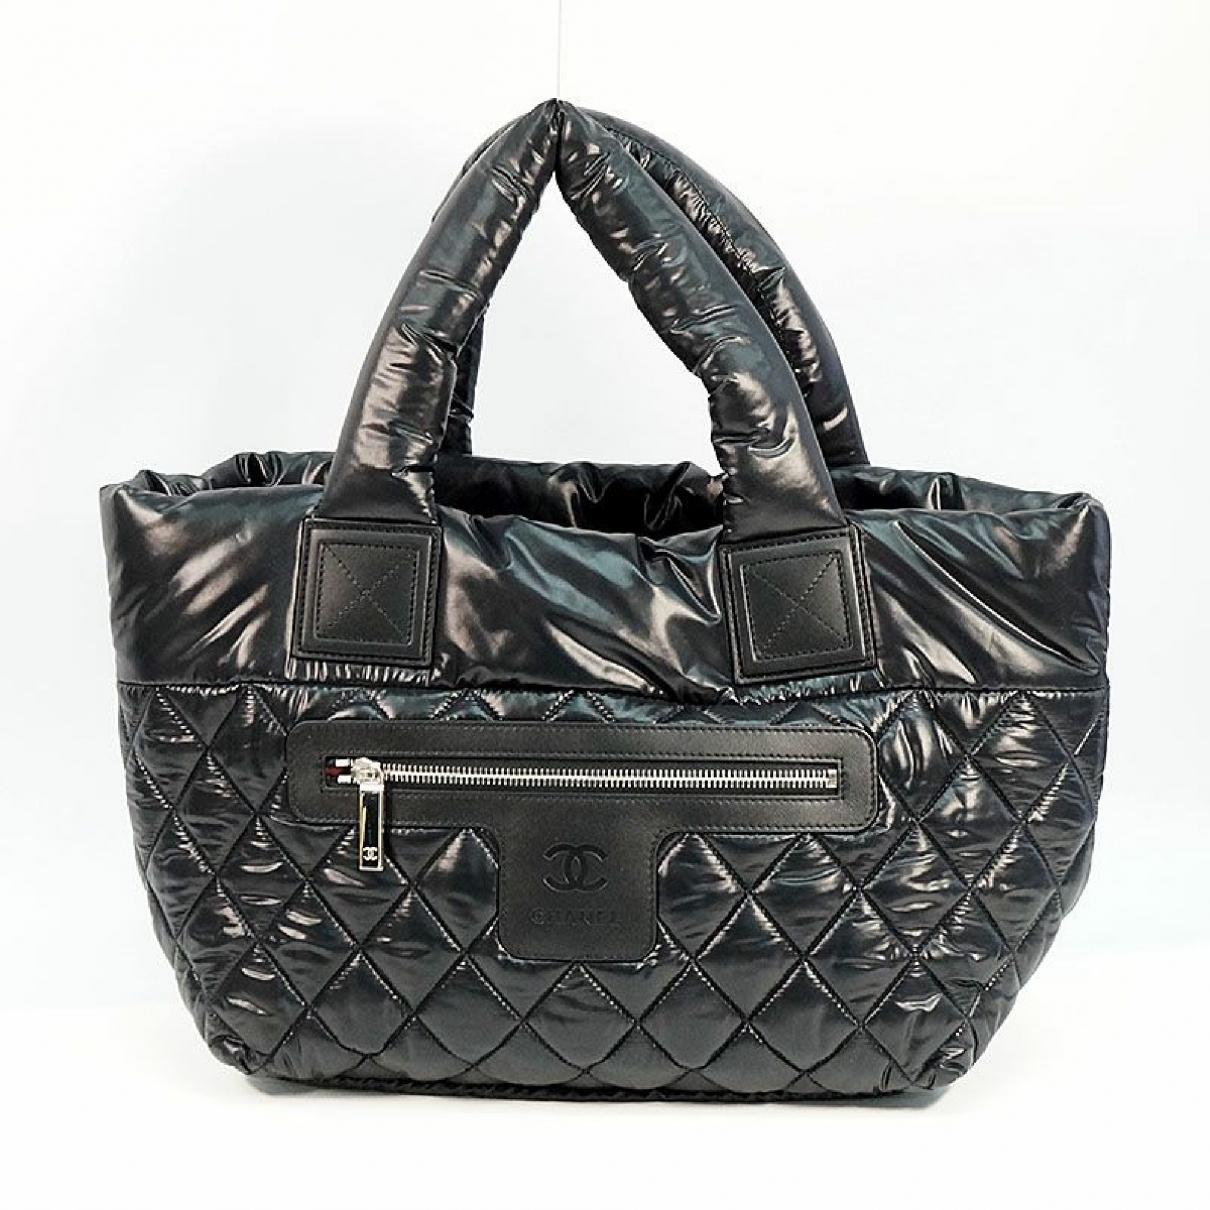 Chanel Coco Cocoon Handtasche in Synthetik